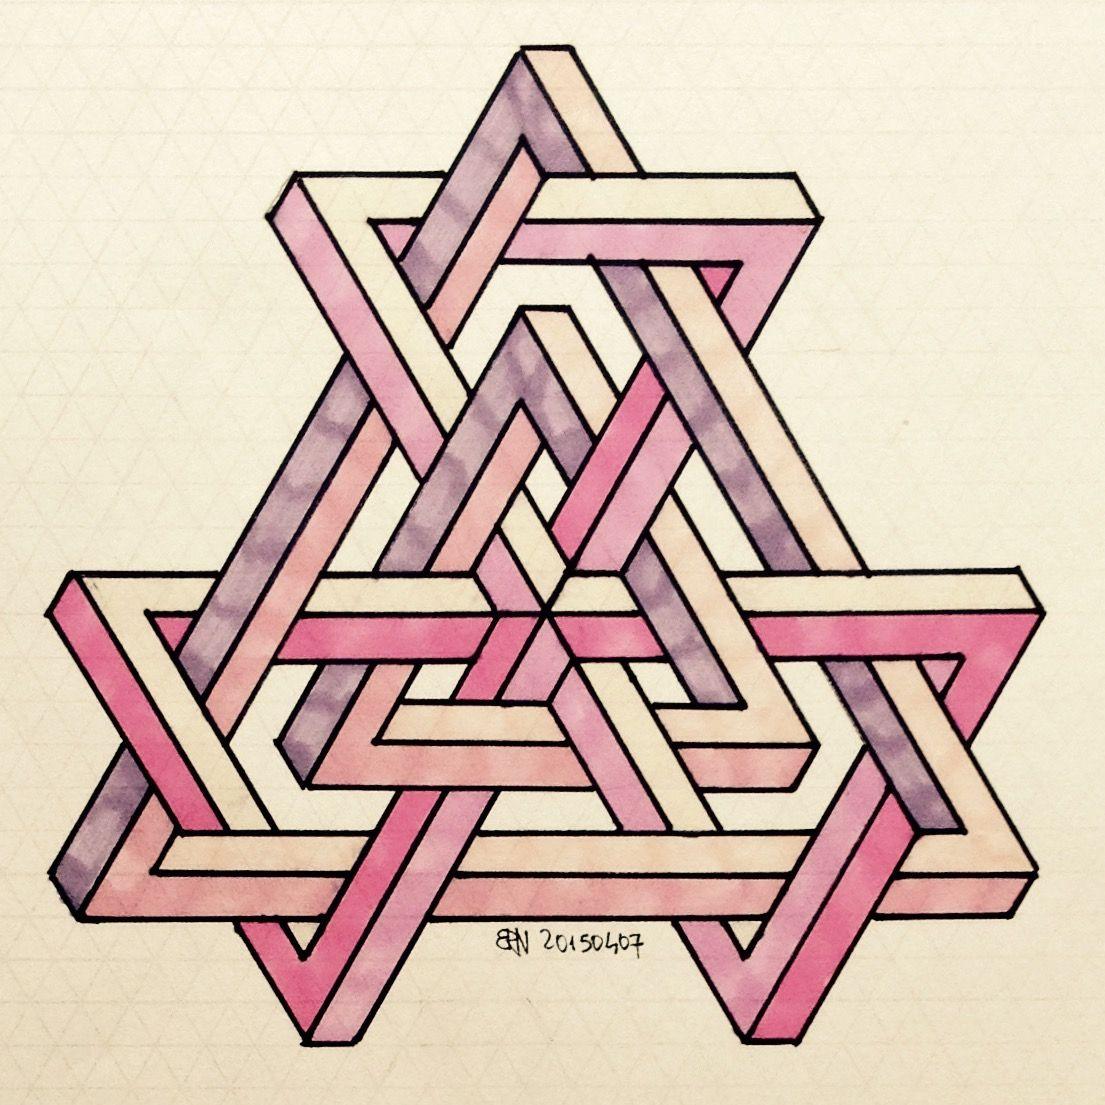 Impossible Isometric Penrosetriangle Oscar Reutersward